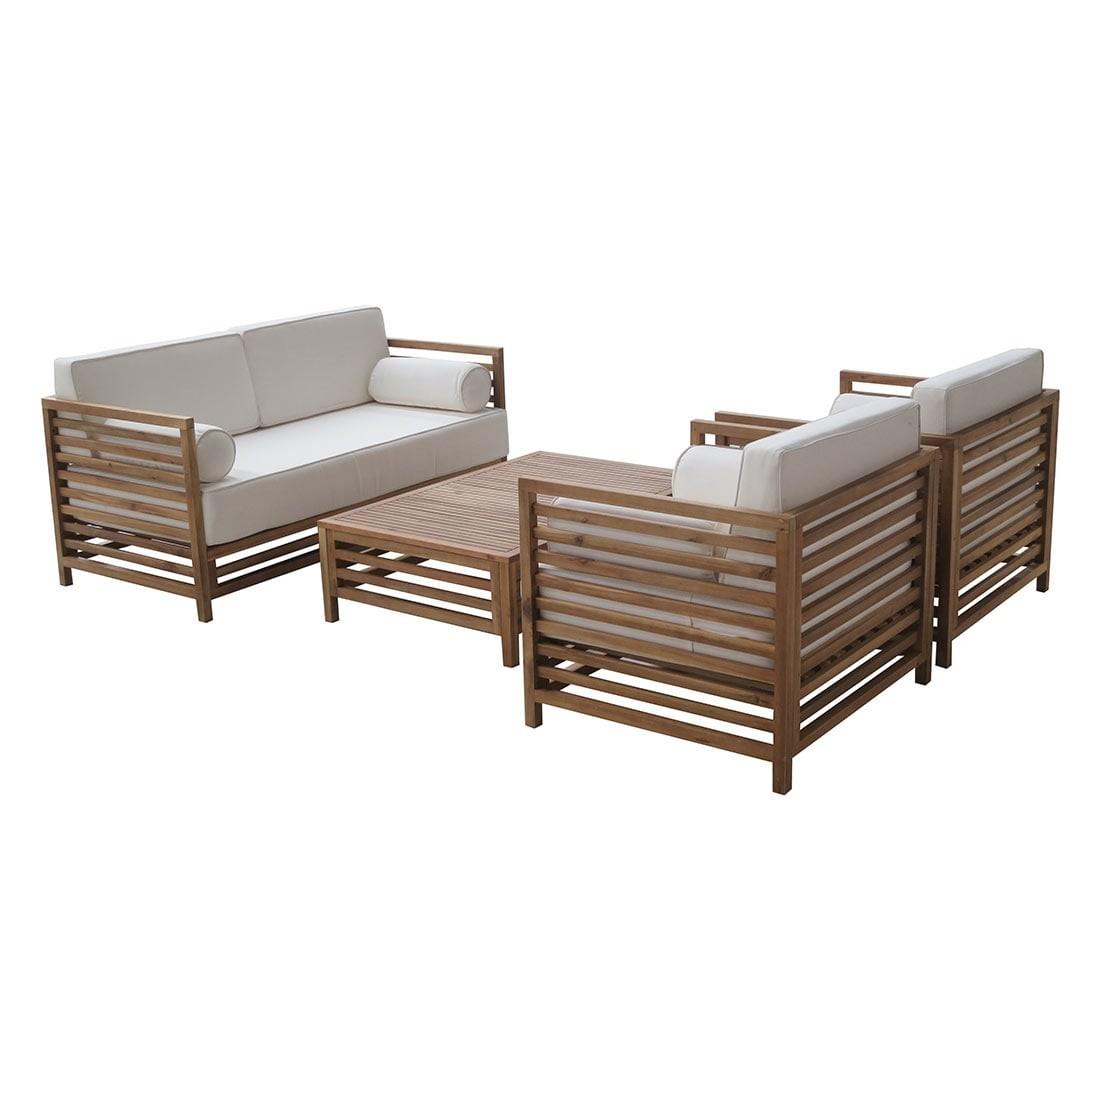 Full Size of Loungemobel Terrasse Sale Caseconradcom Loungemöbel Garten Holz Günstig Wohnzimmer Outliv Loungemöbel